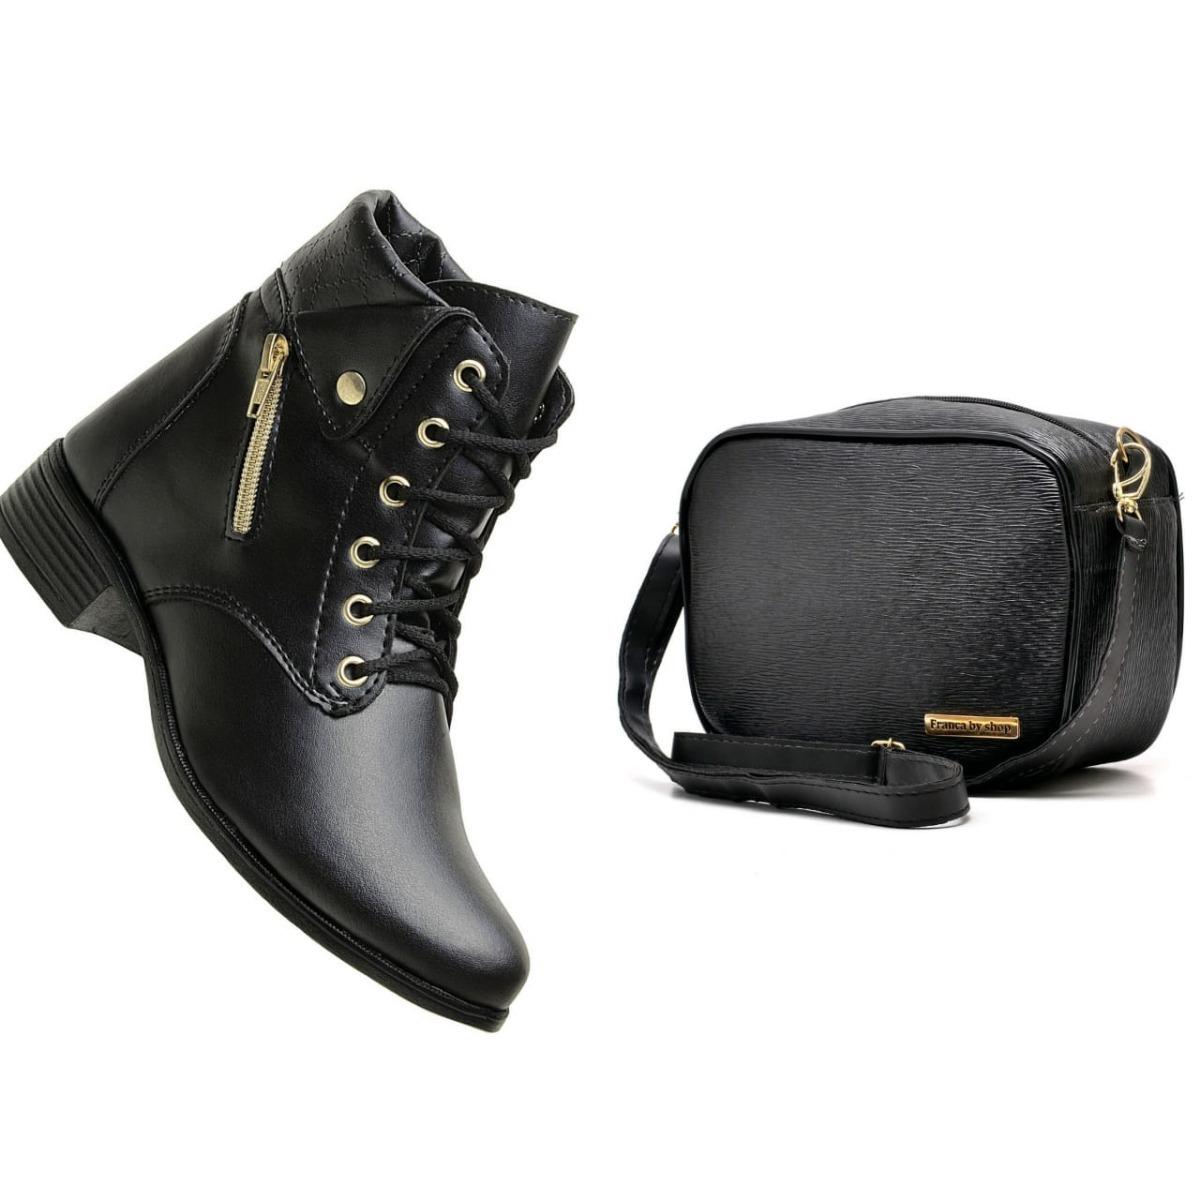 d7dc0c9fe bota feminina coturno cano curto + bolsa mini bag exclusivo. Carregando zoom .